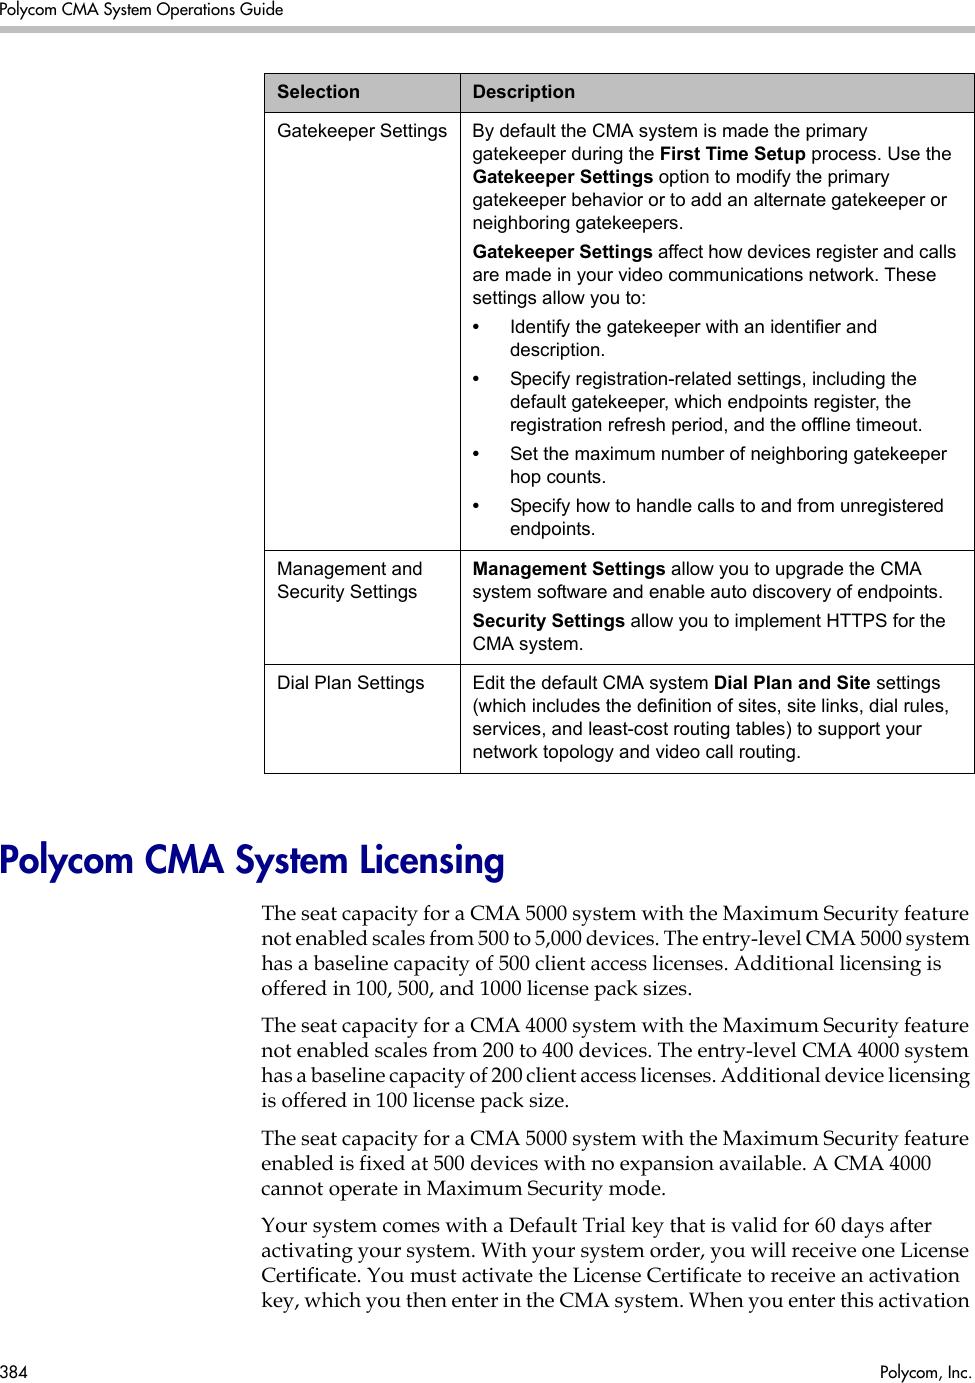 Polycom Welding System 3725 77601 001H Users Manual CMA